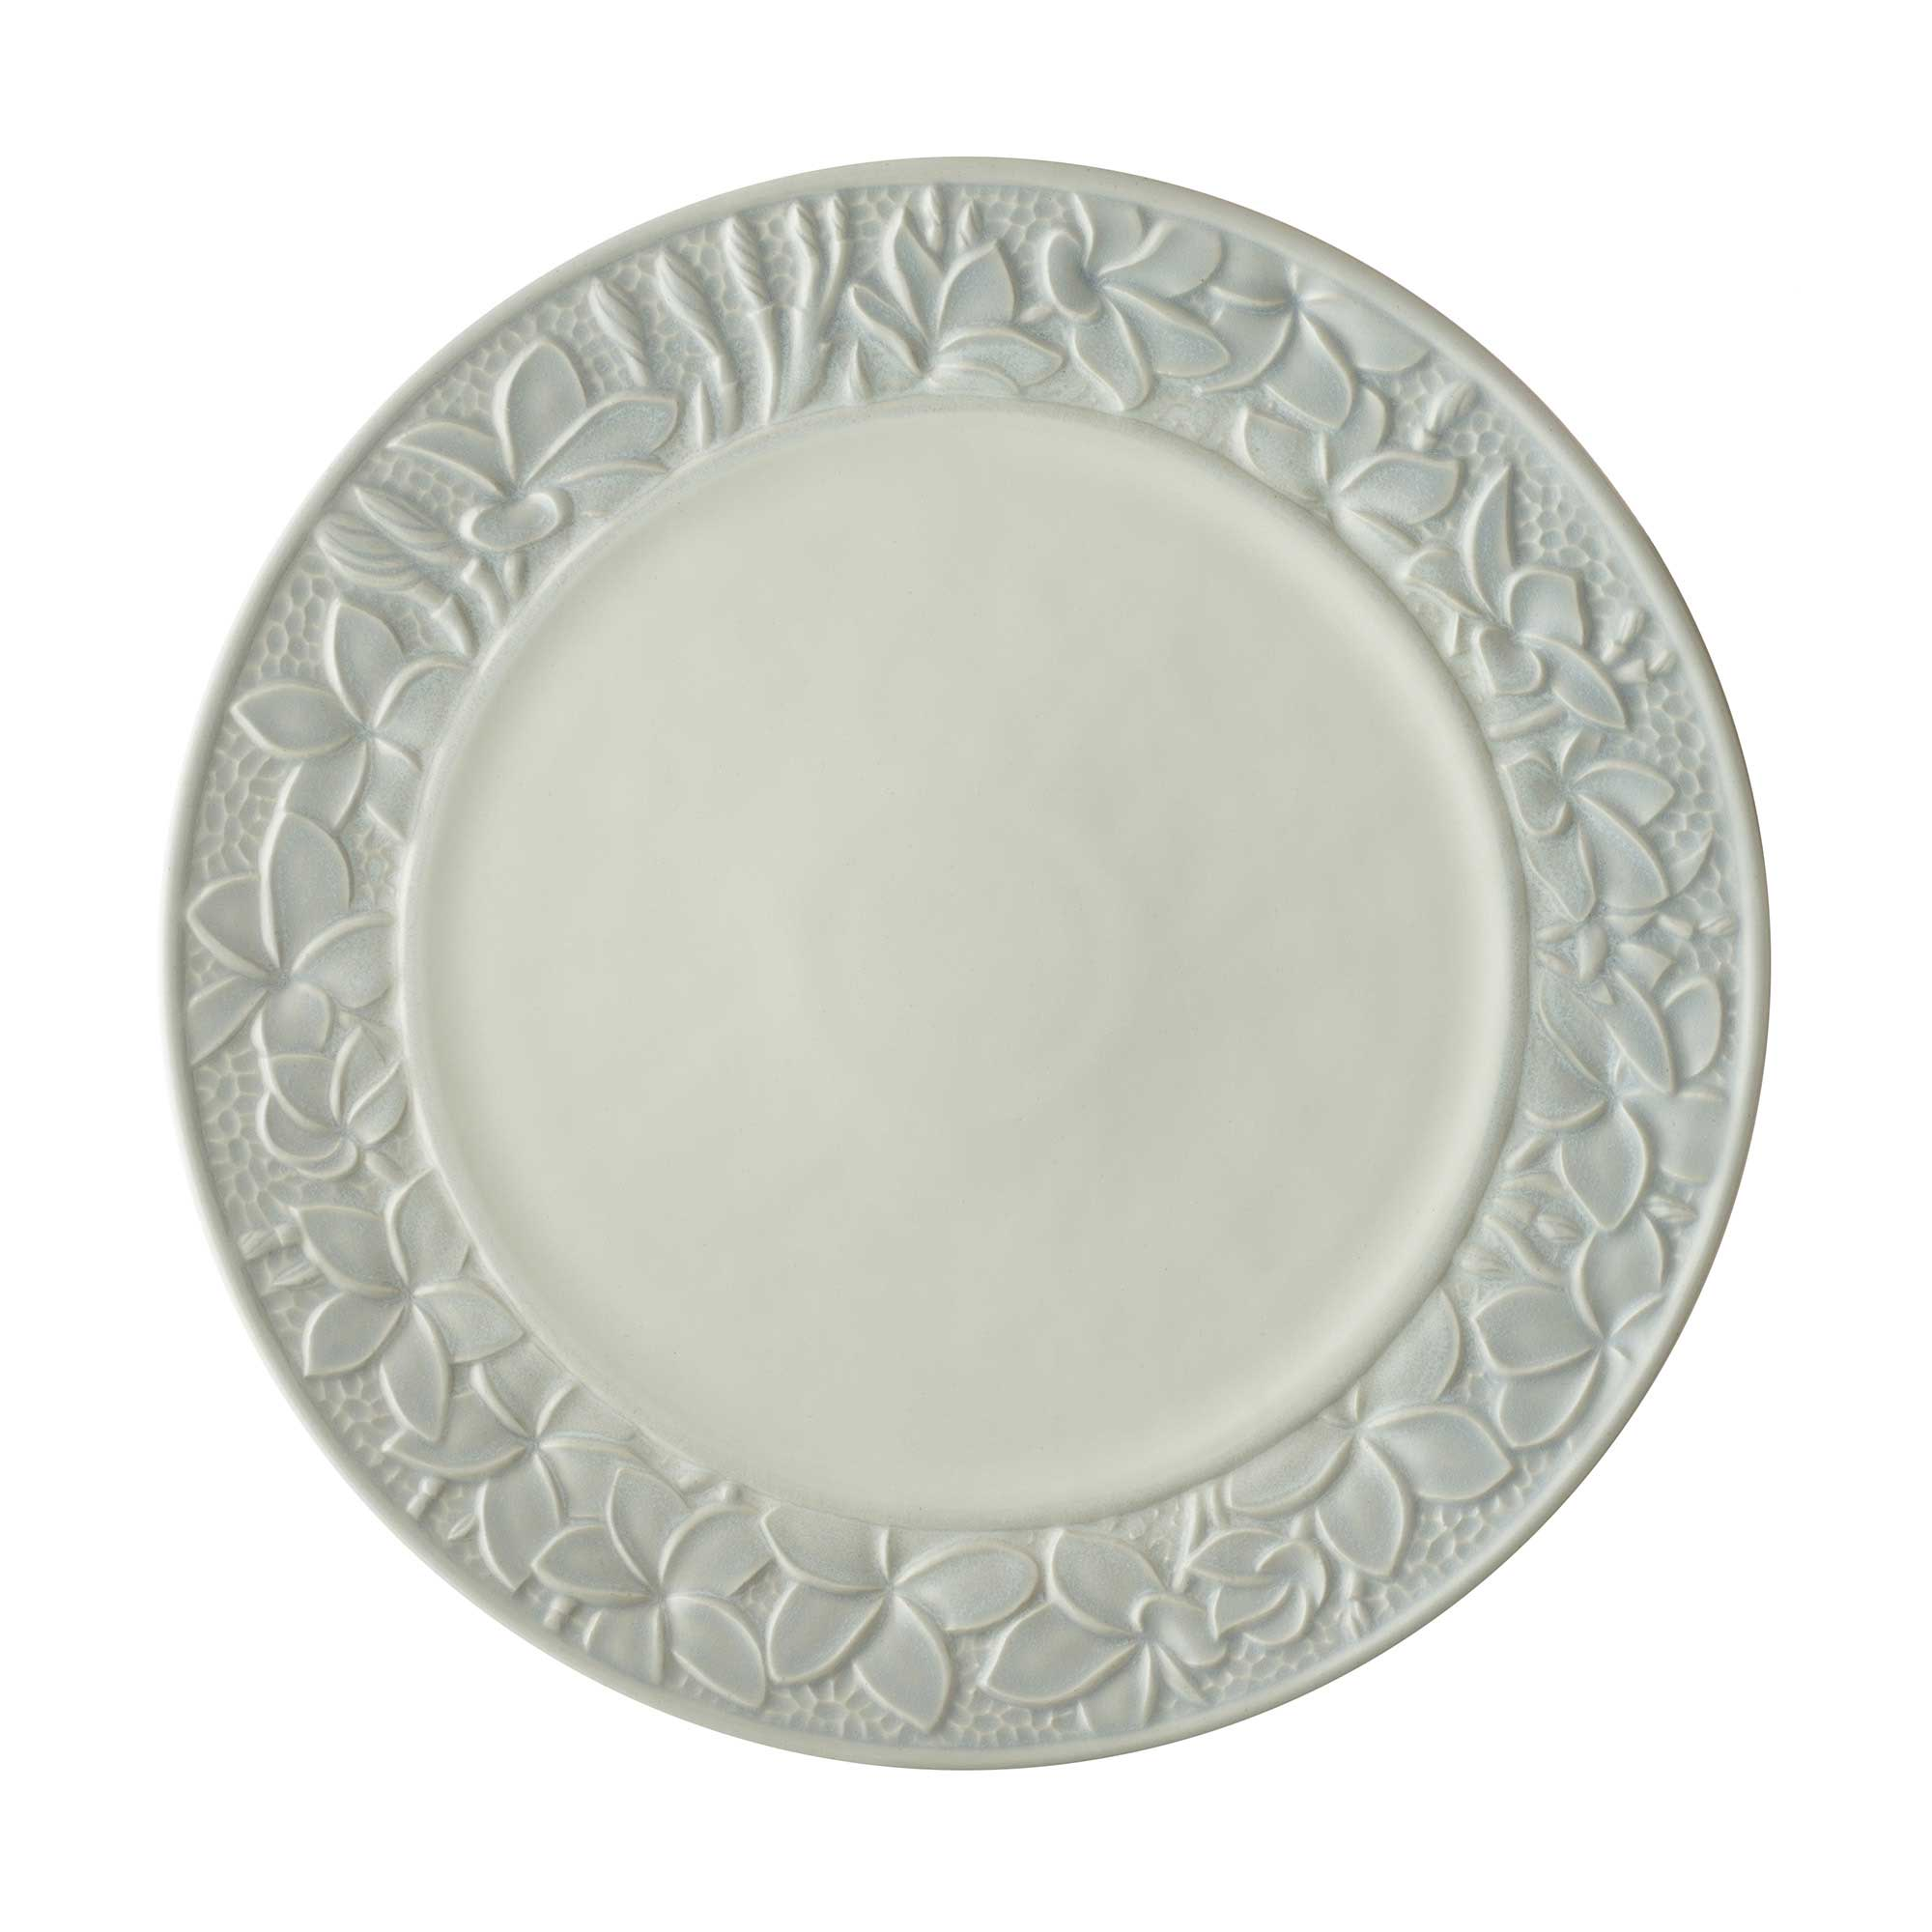 Frangipani Dinner set by Lukas